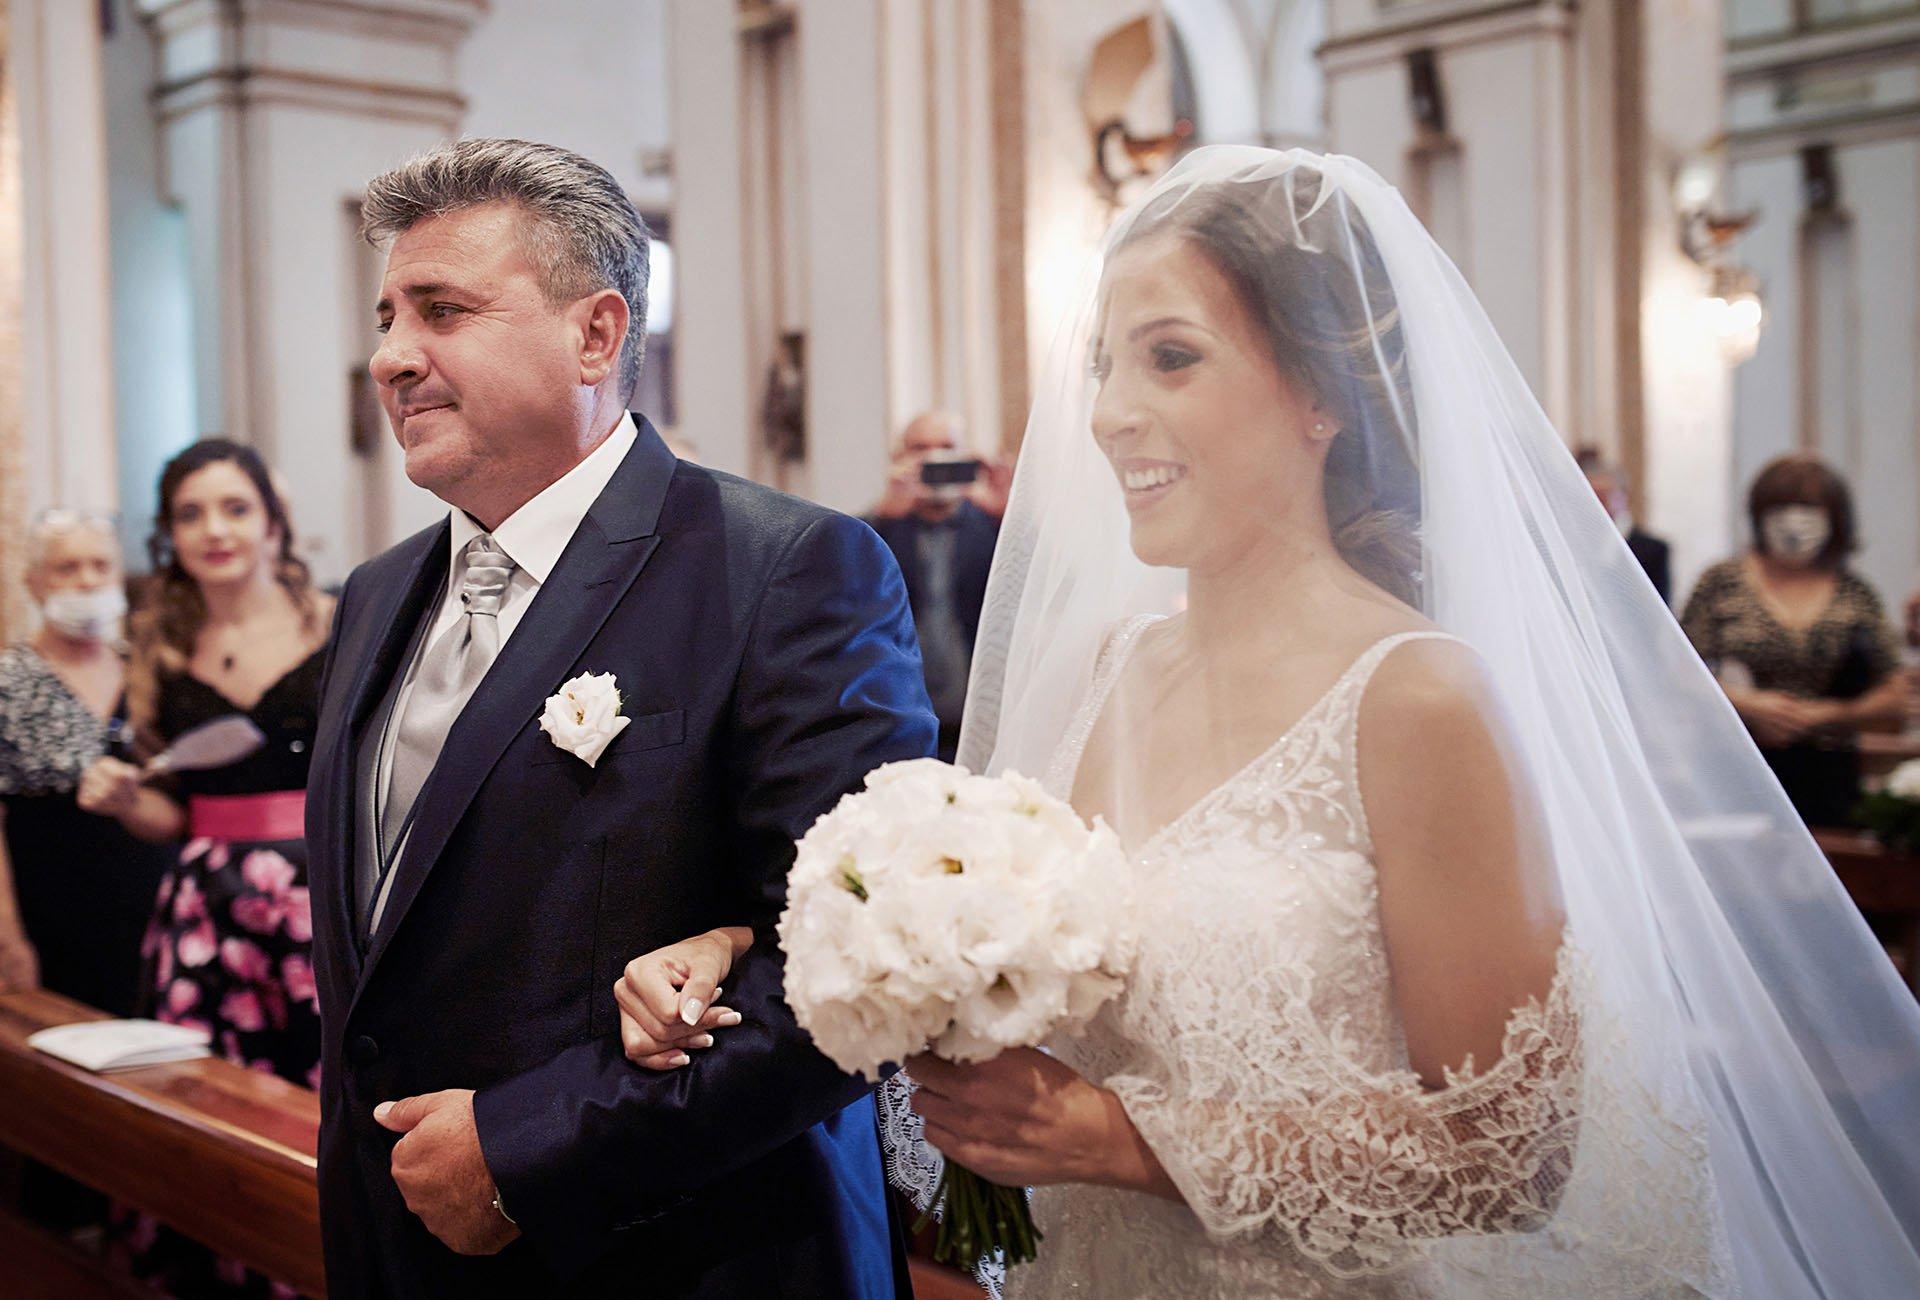 55 Foto matrimonio: i momenti immancabili nell'album